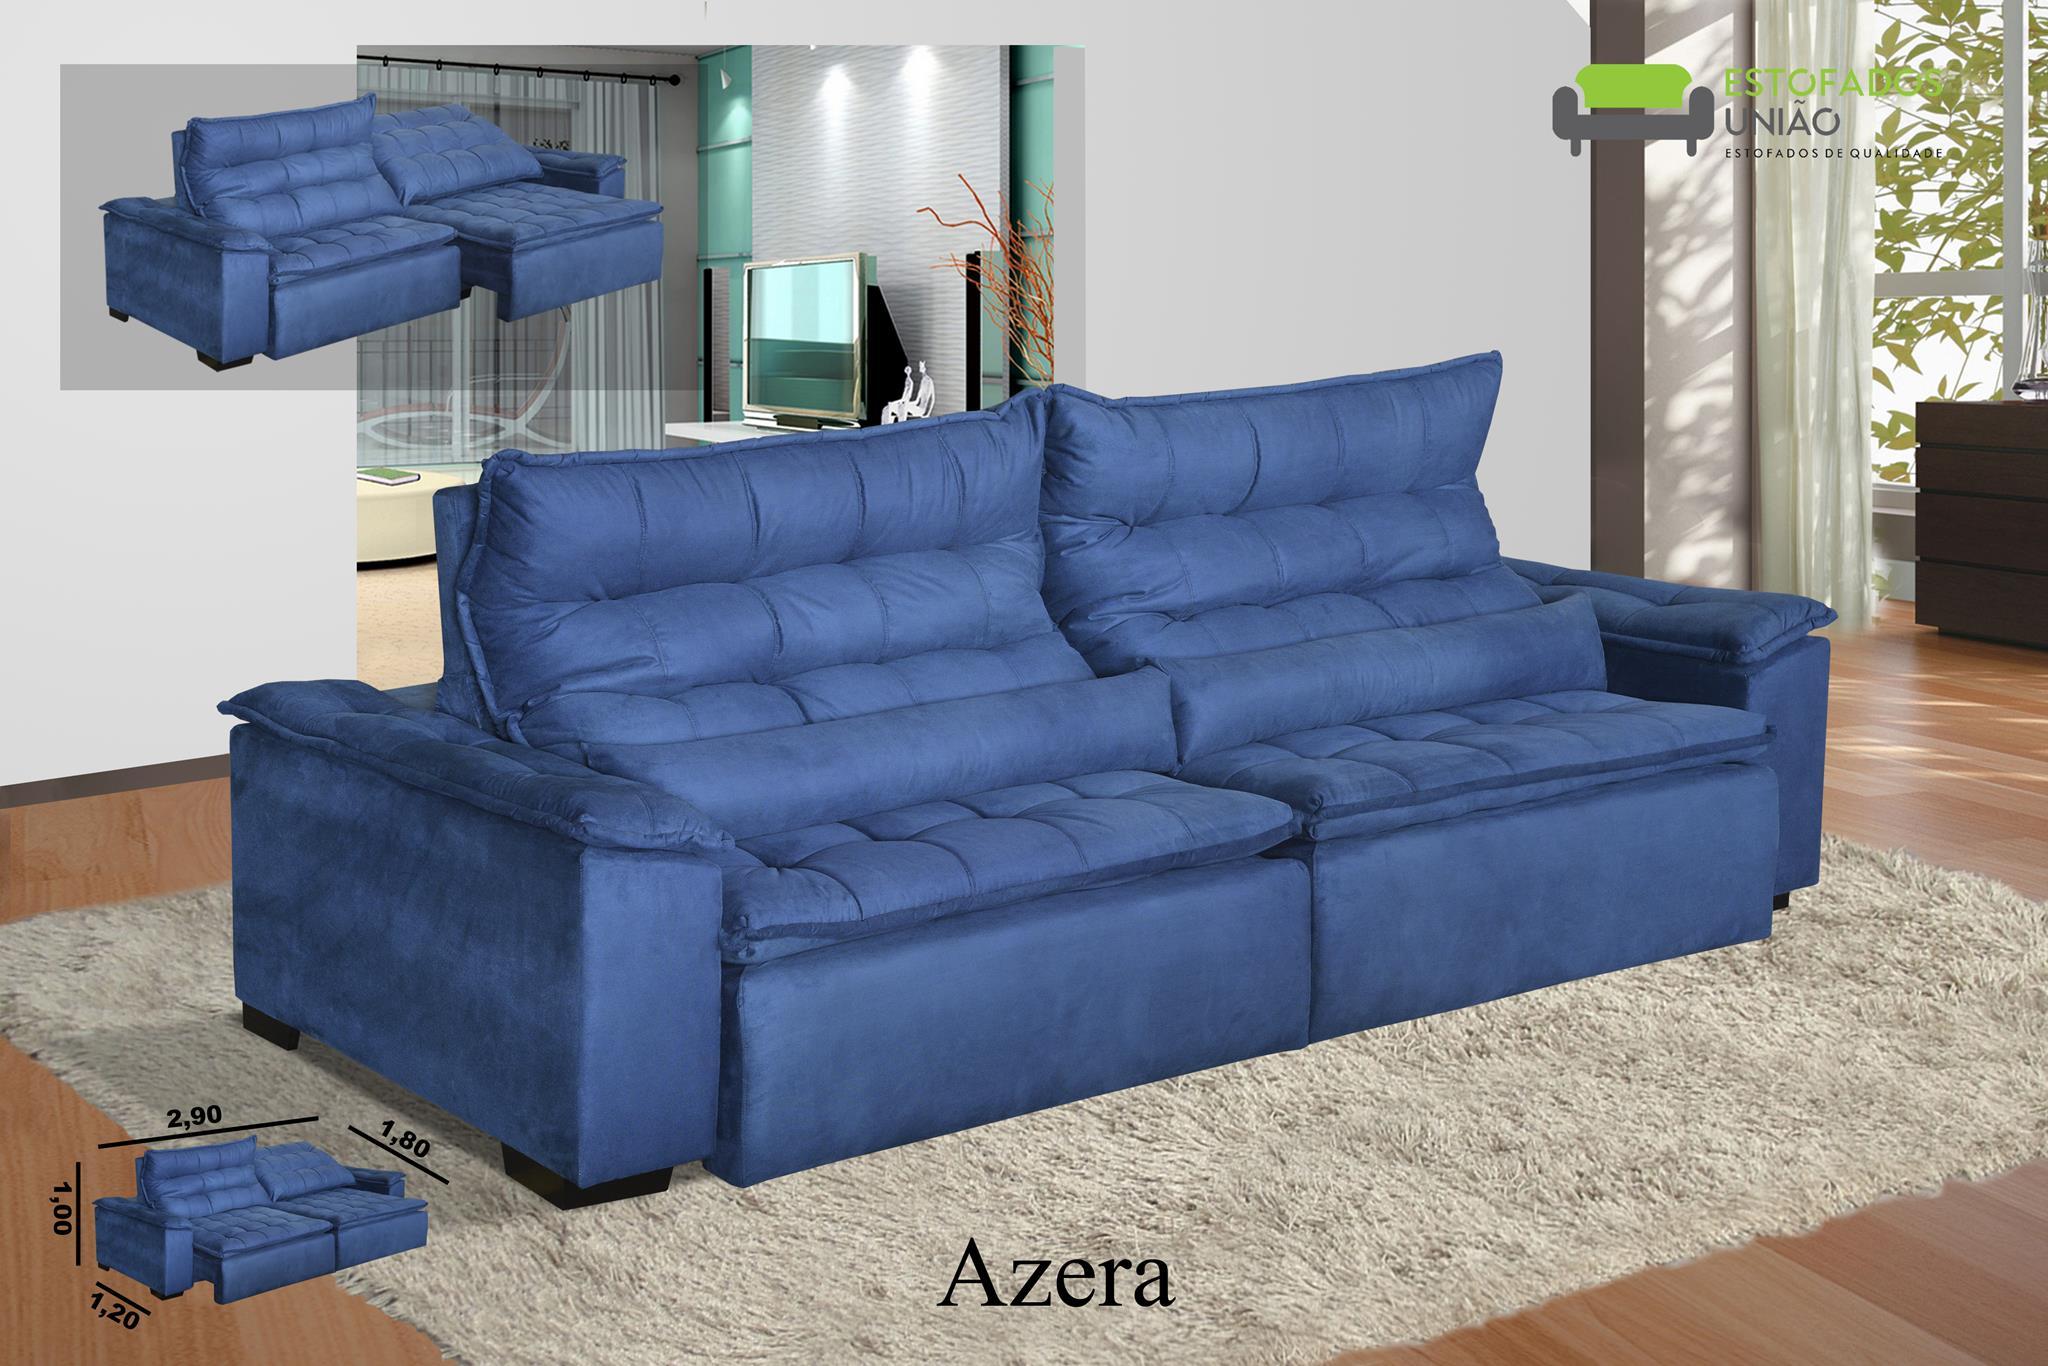 Azera_2048x1366